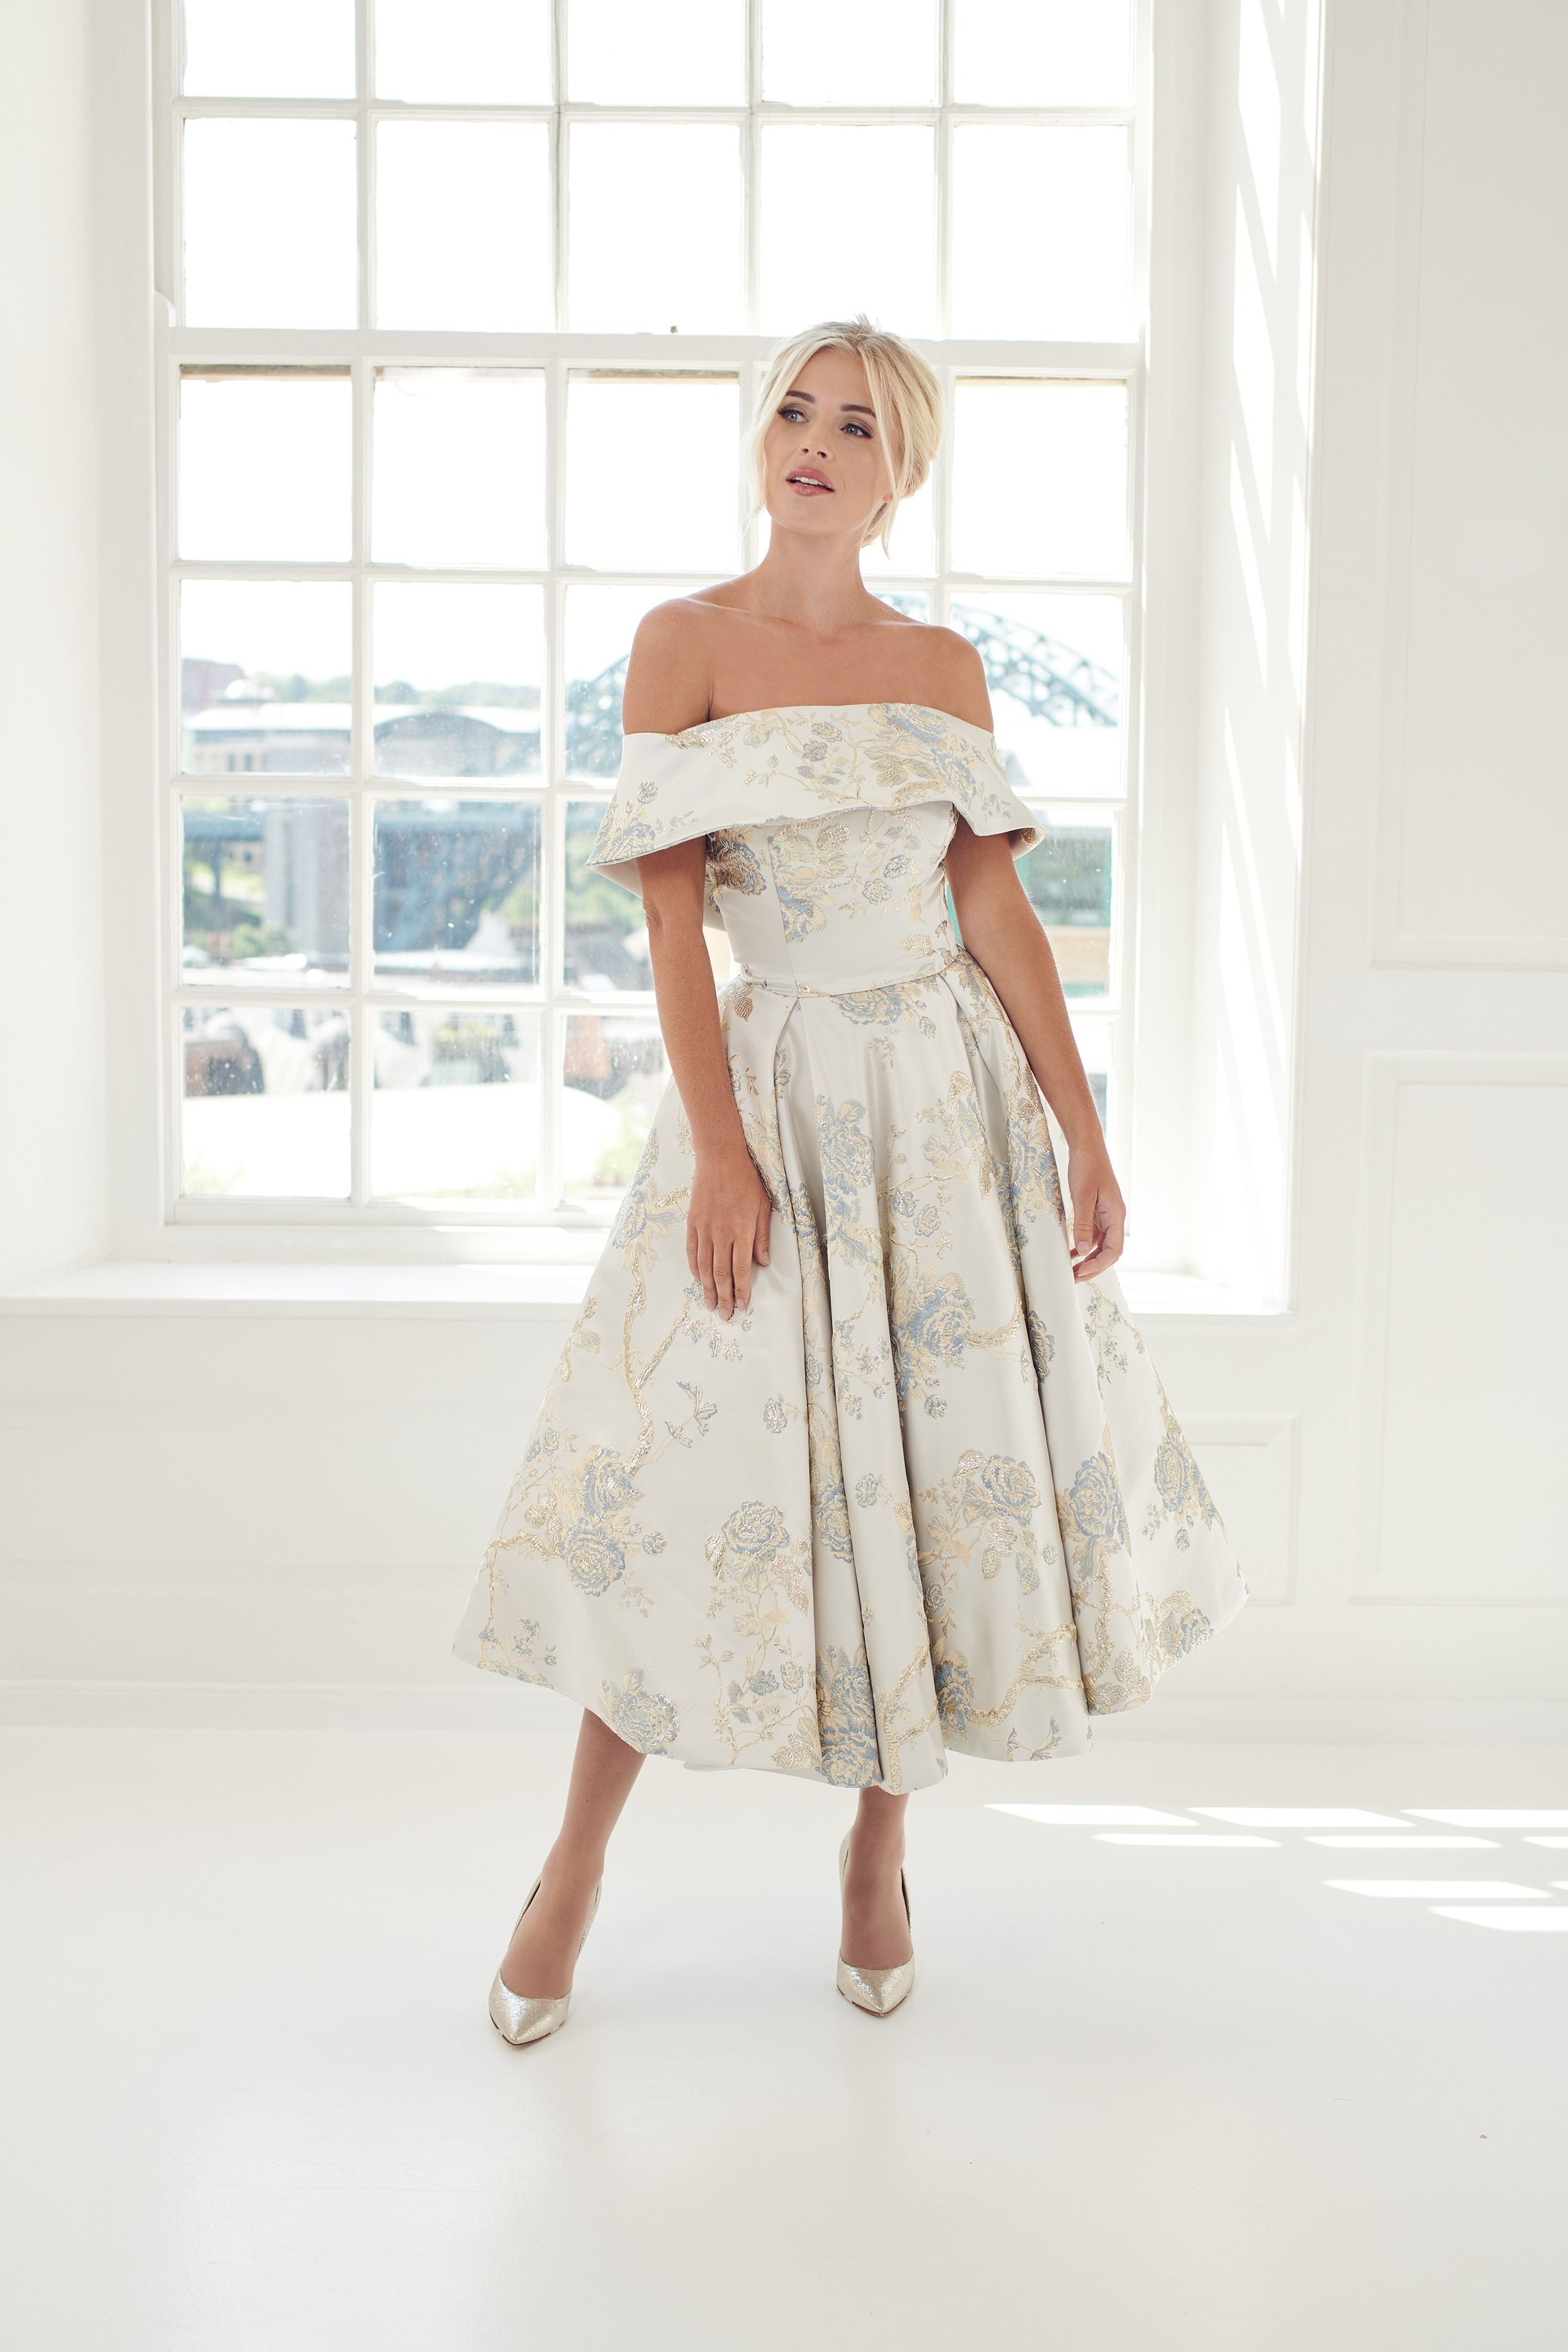 Margaret Demure Blue And Grey Floral Brocade Short Ballerina Length Wedding Dress Floral Tea Length Dress Short Wedding Gowns Rockabilly Wedding Dresses [ 3720 x 2480 Pixel ]